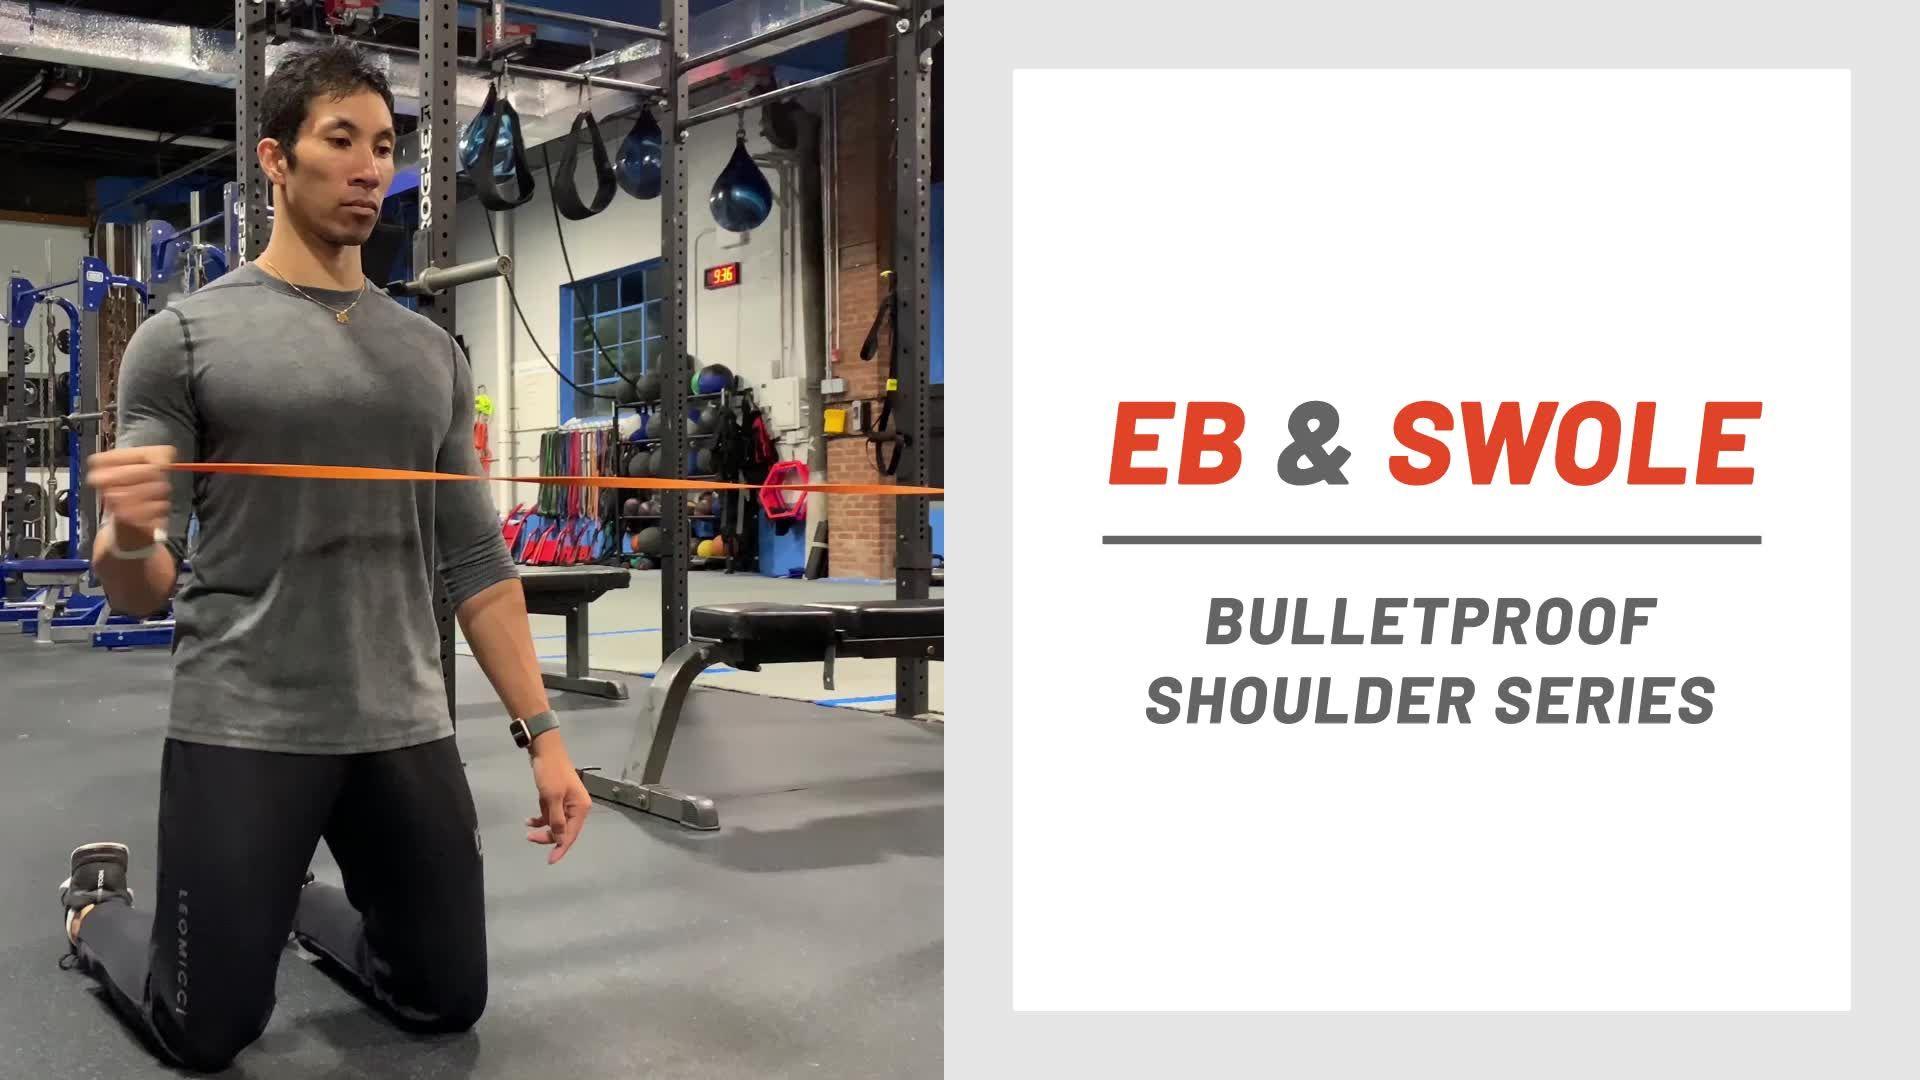 Bulletproof Your Shoulders in Just 5 Minutes